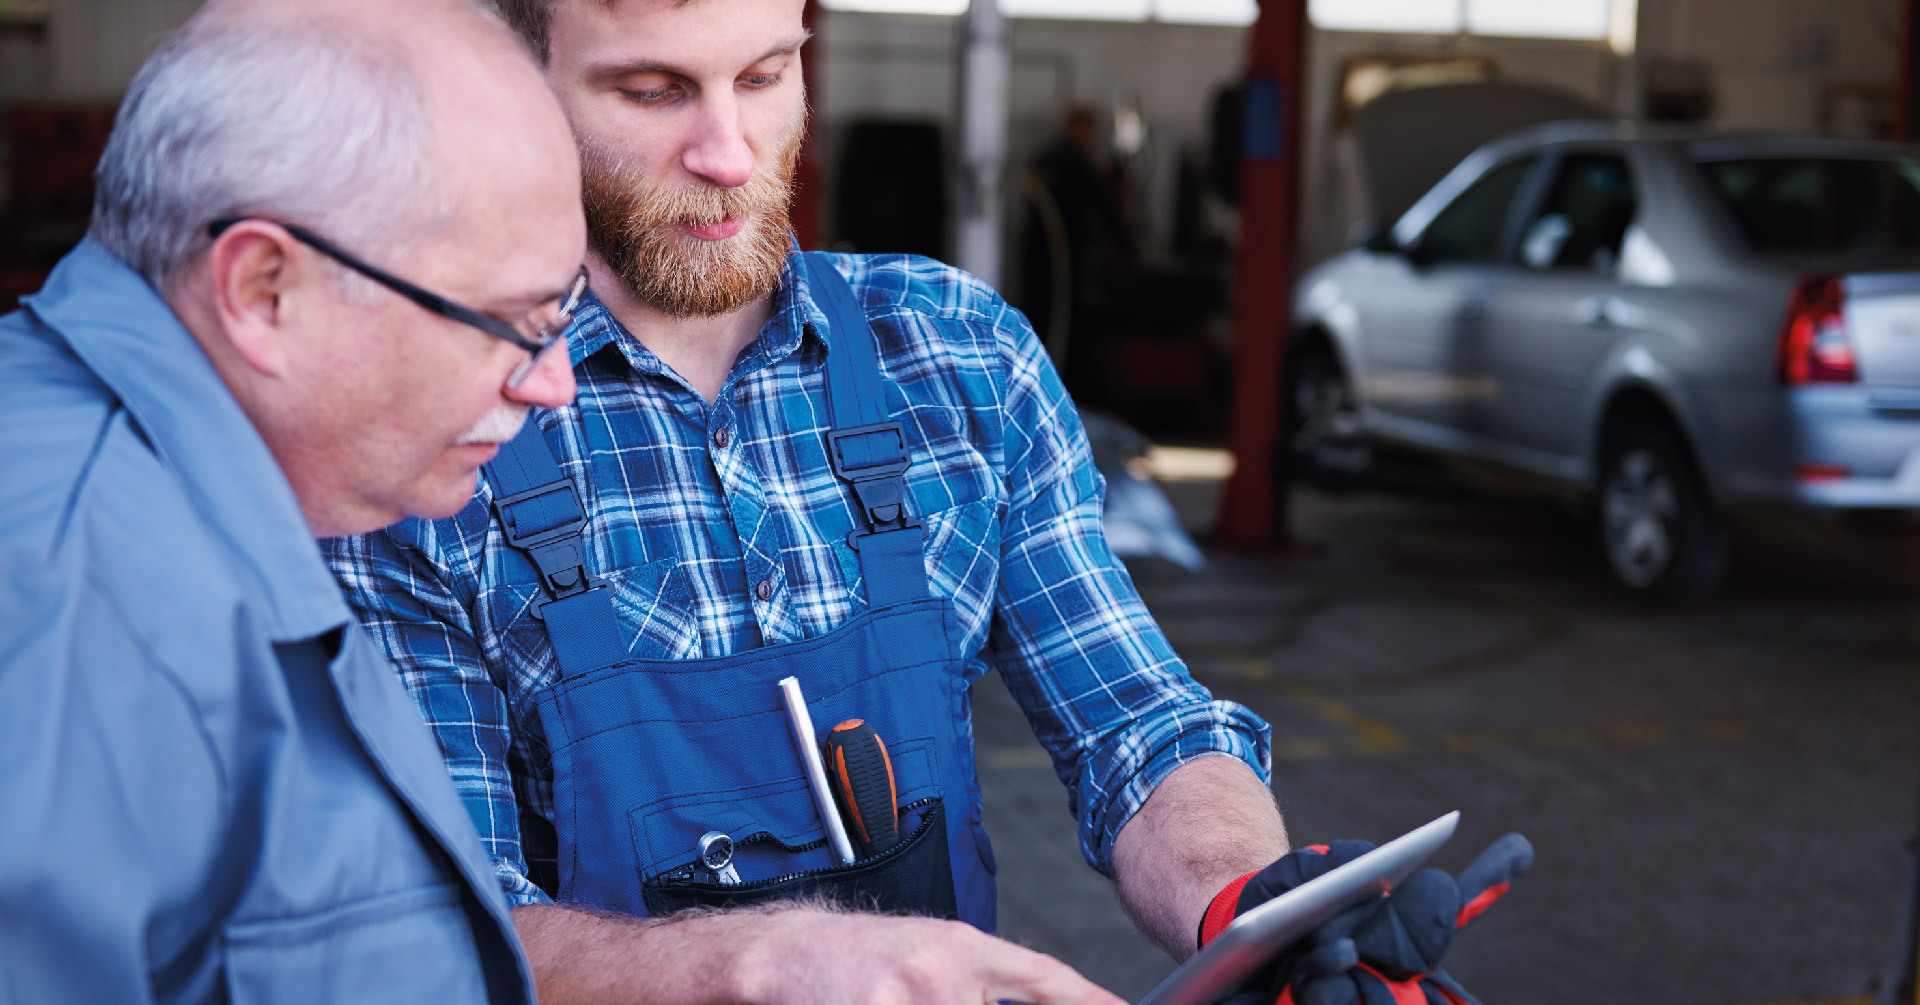 aumentar as vendas da oficina mecânica